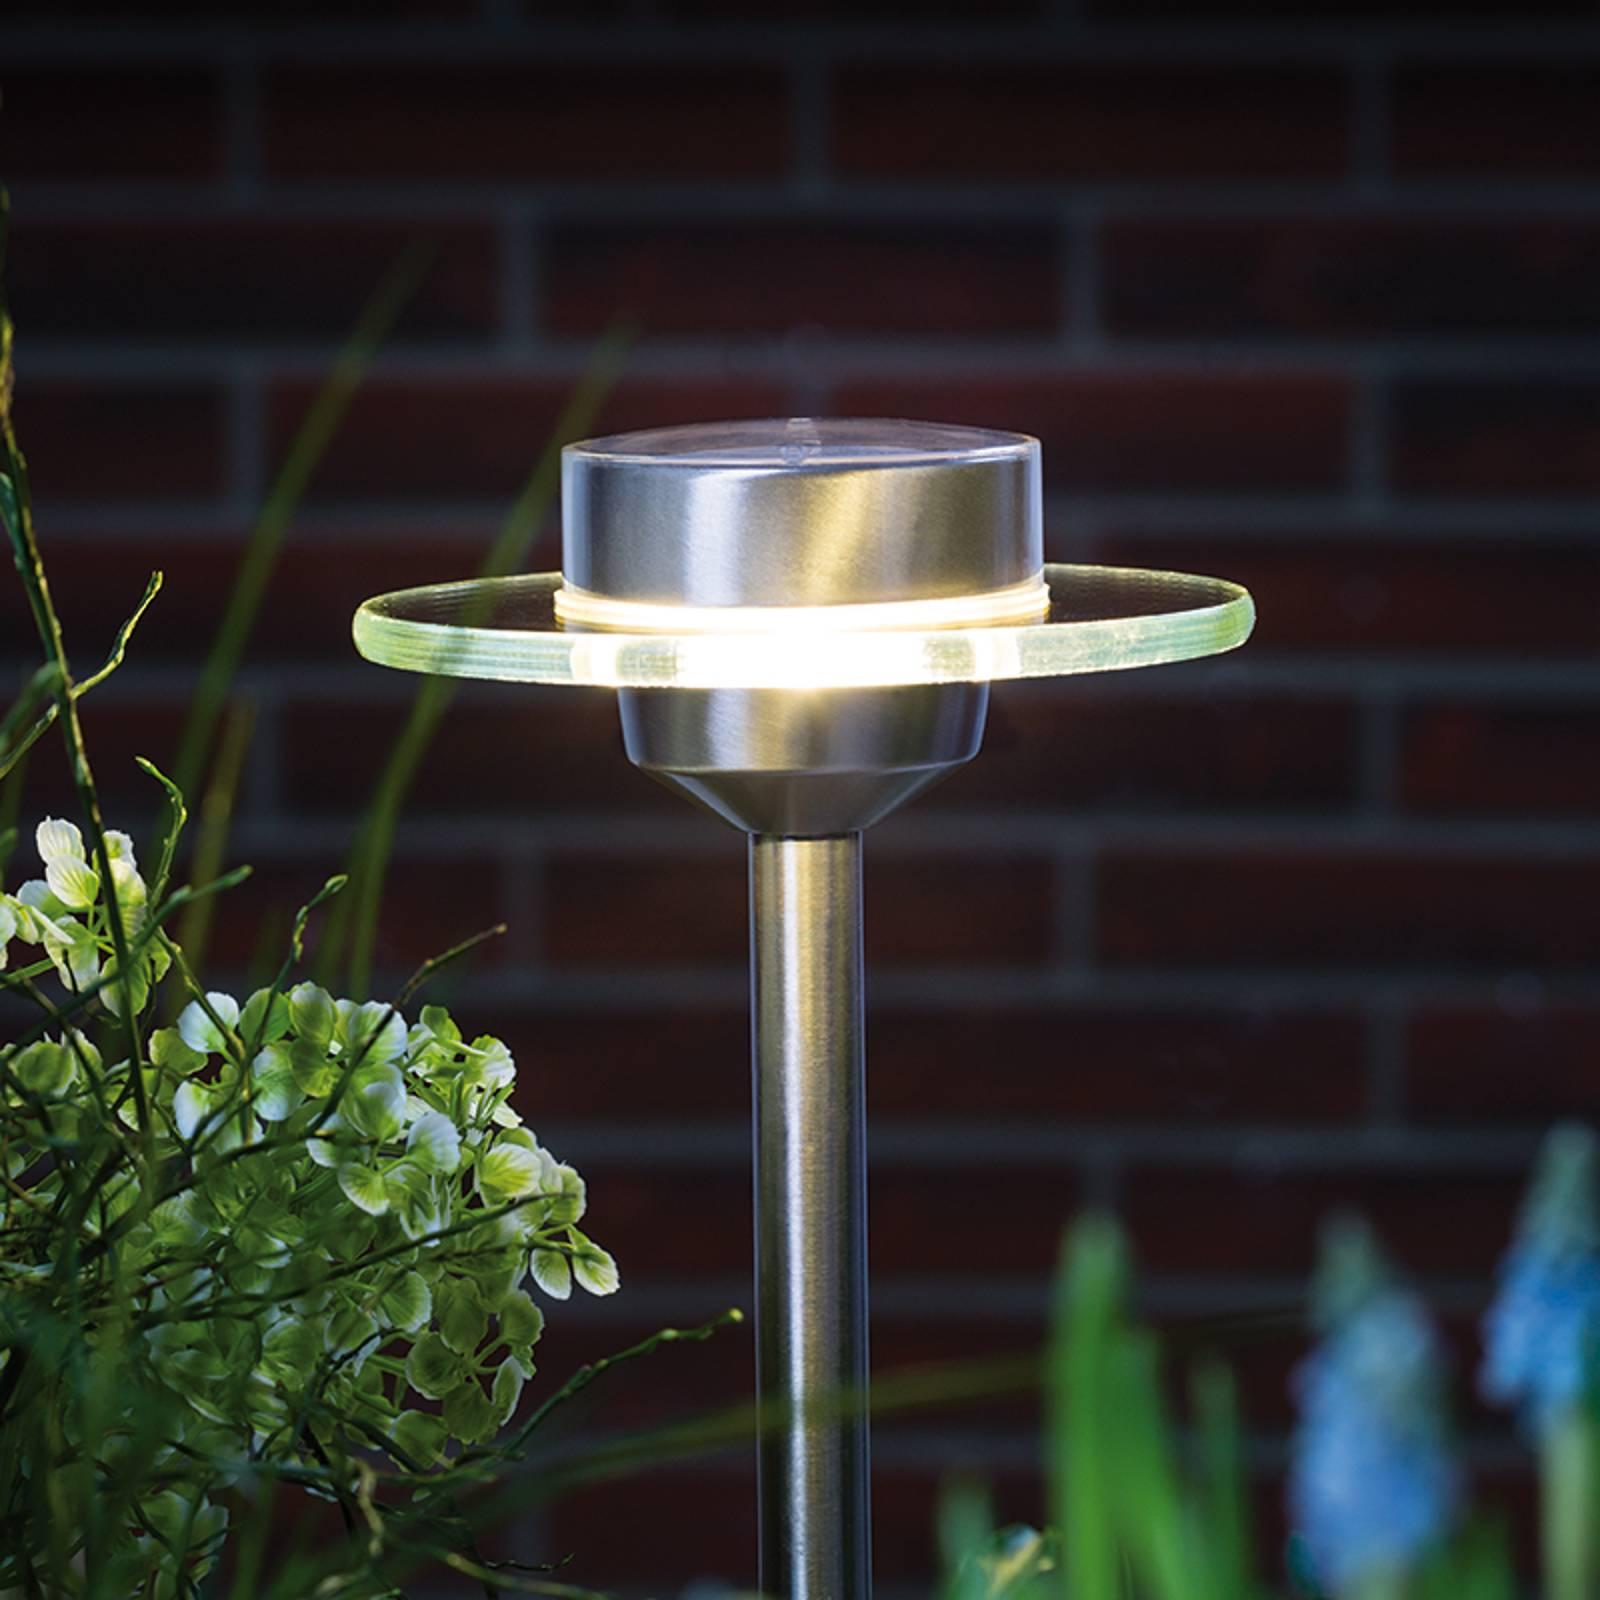 Lampa solarna UFO z LED, IP44, stal szlachetna